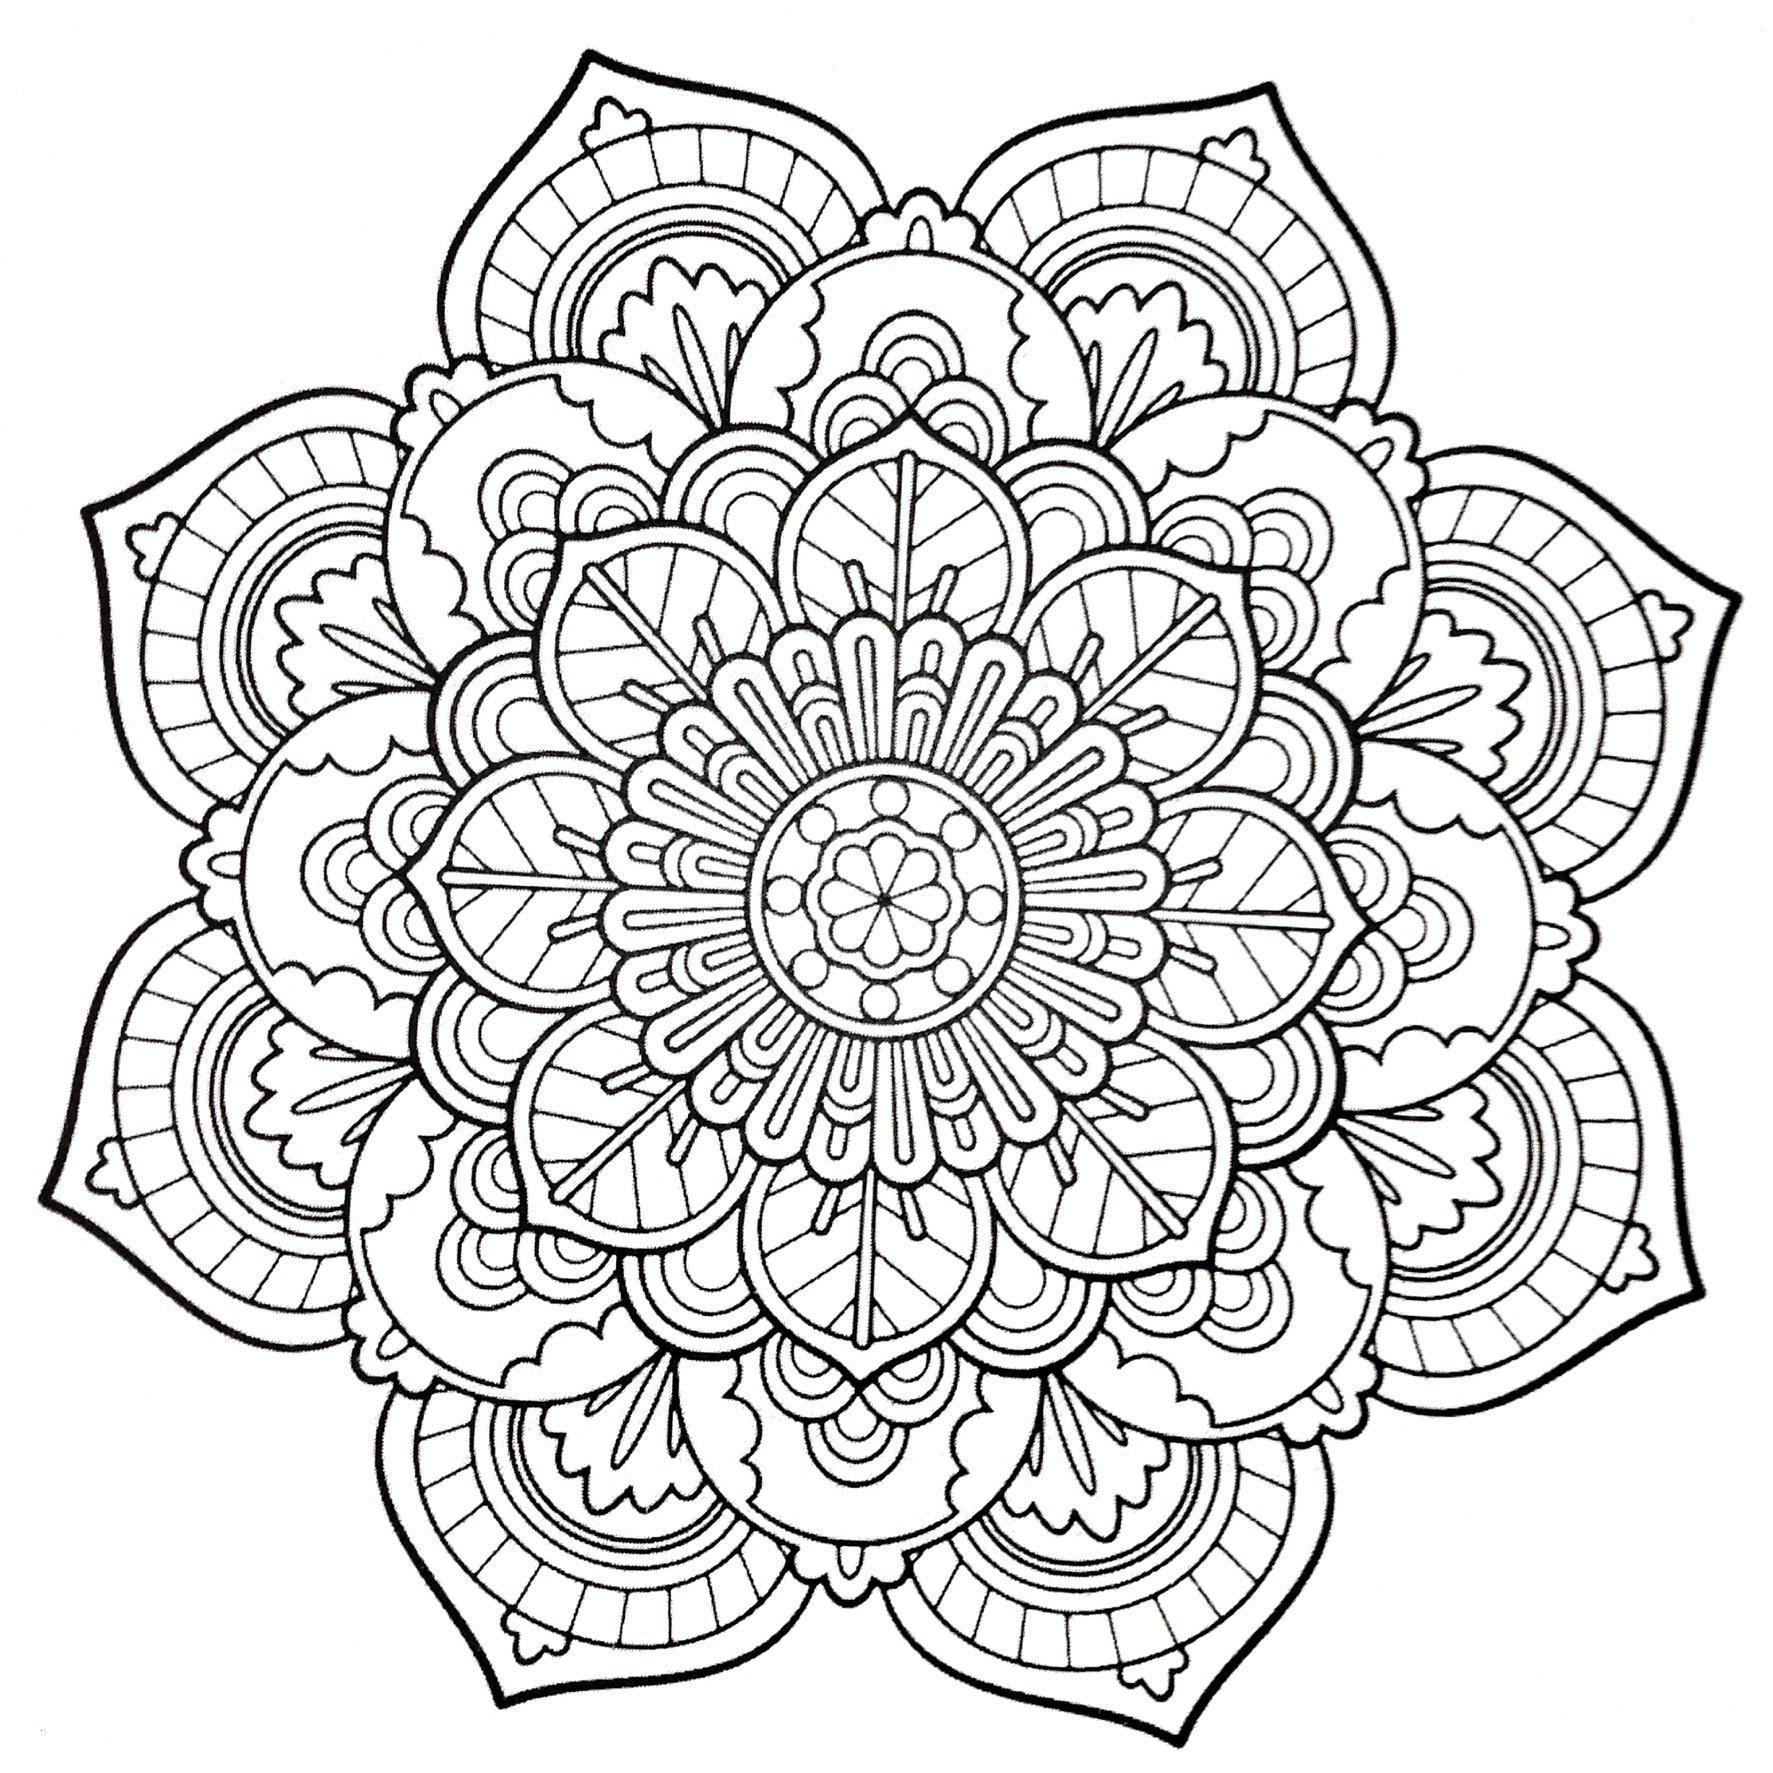 Mandala Zum Ausdrucken Erwachsene Neu Papagei Mandala Ausmalbilder Zum Ausdrucken Parrot Mandala Coloring Bild